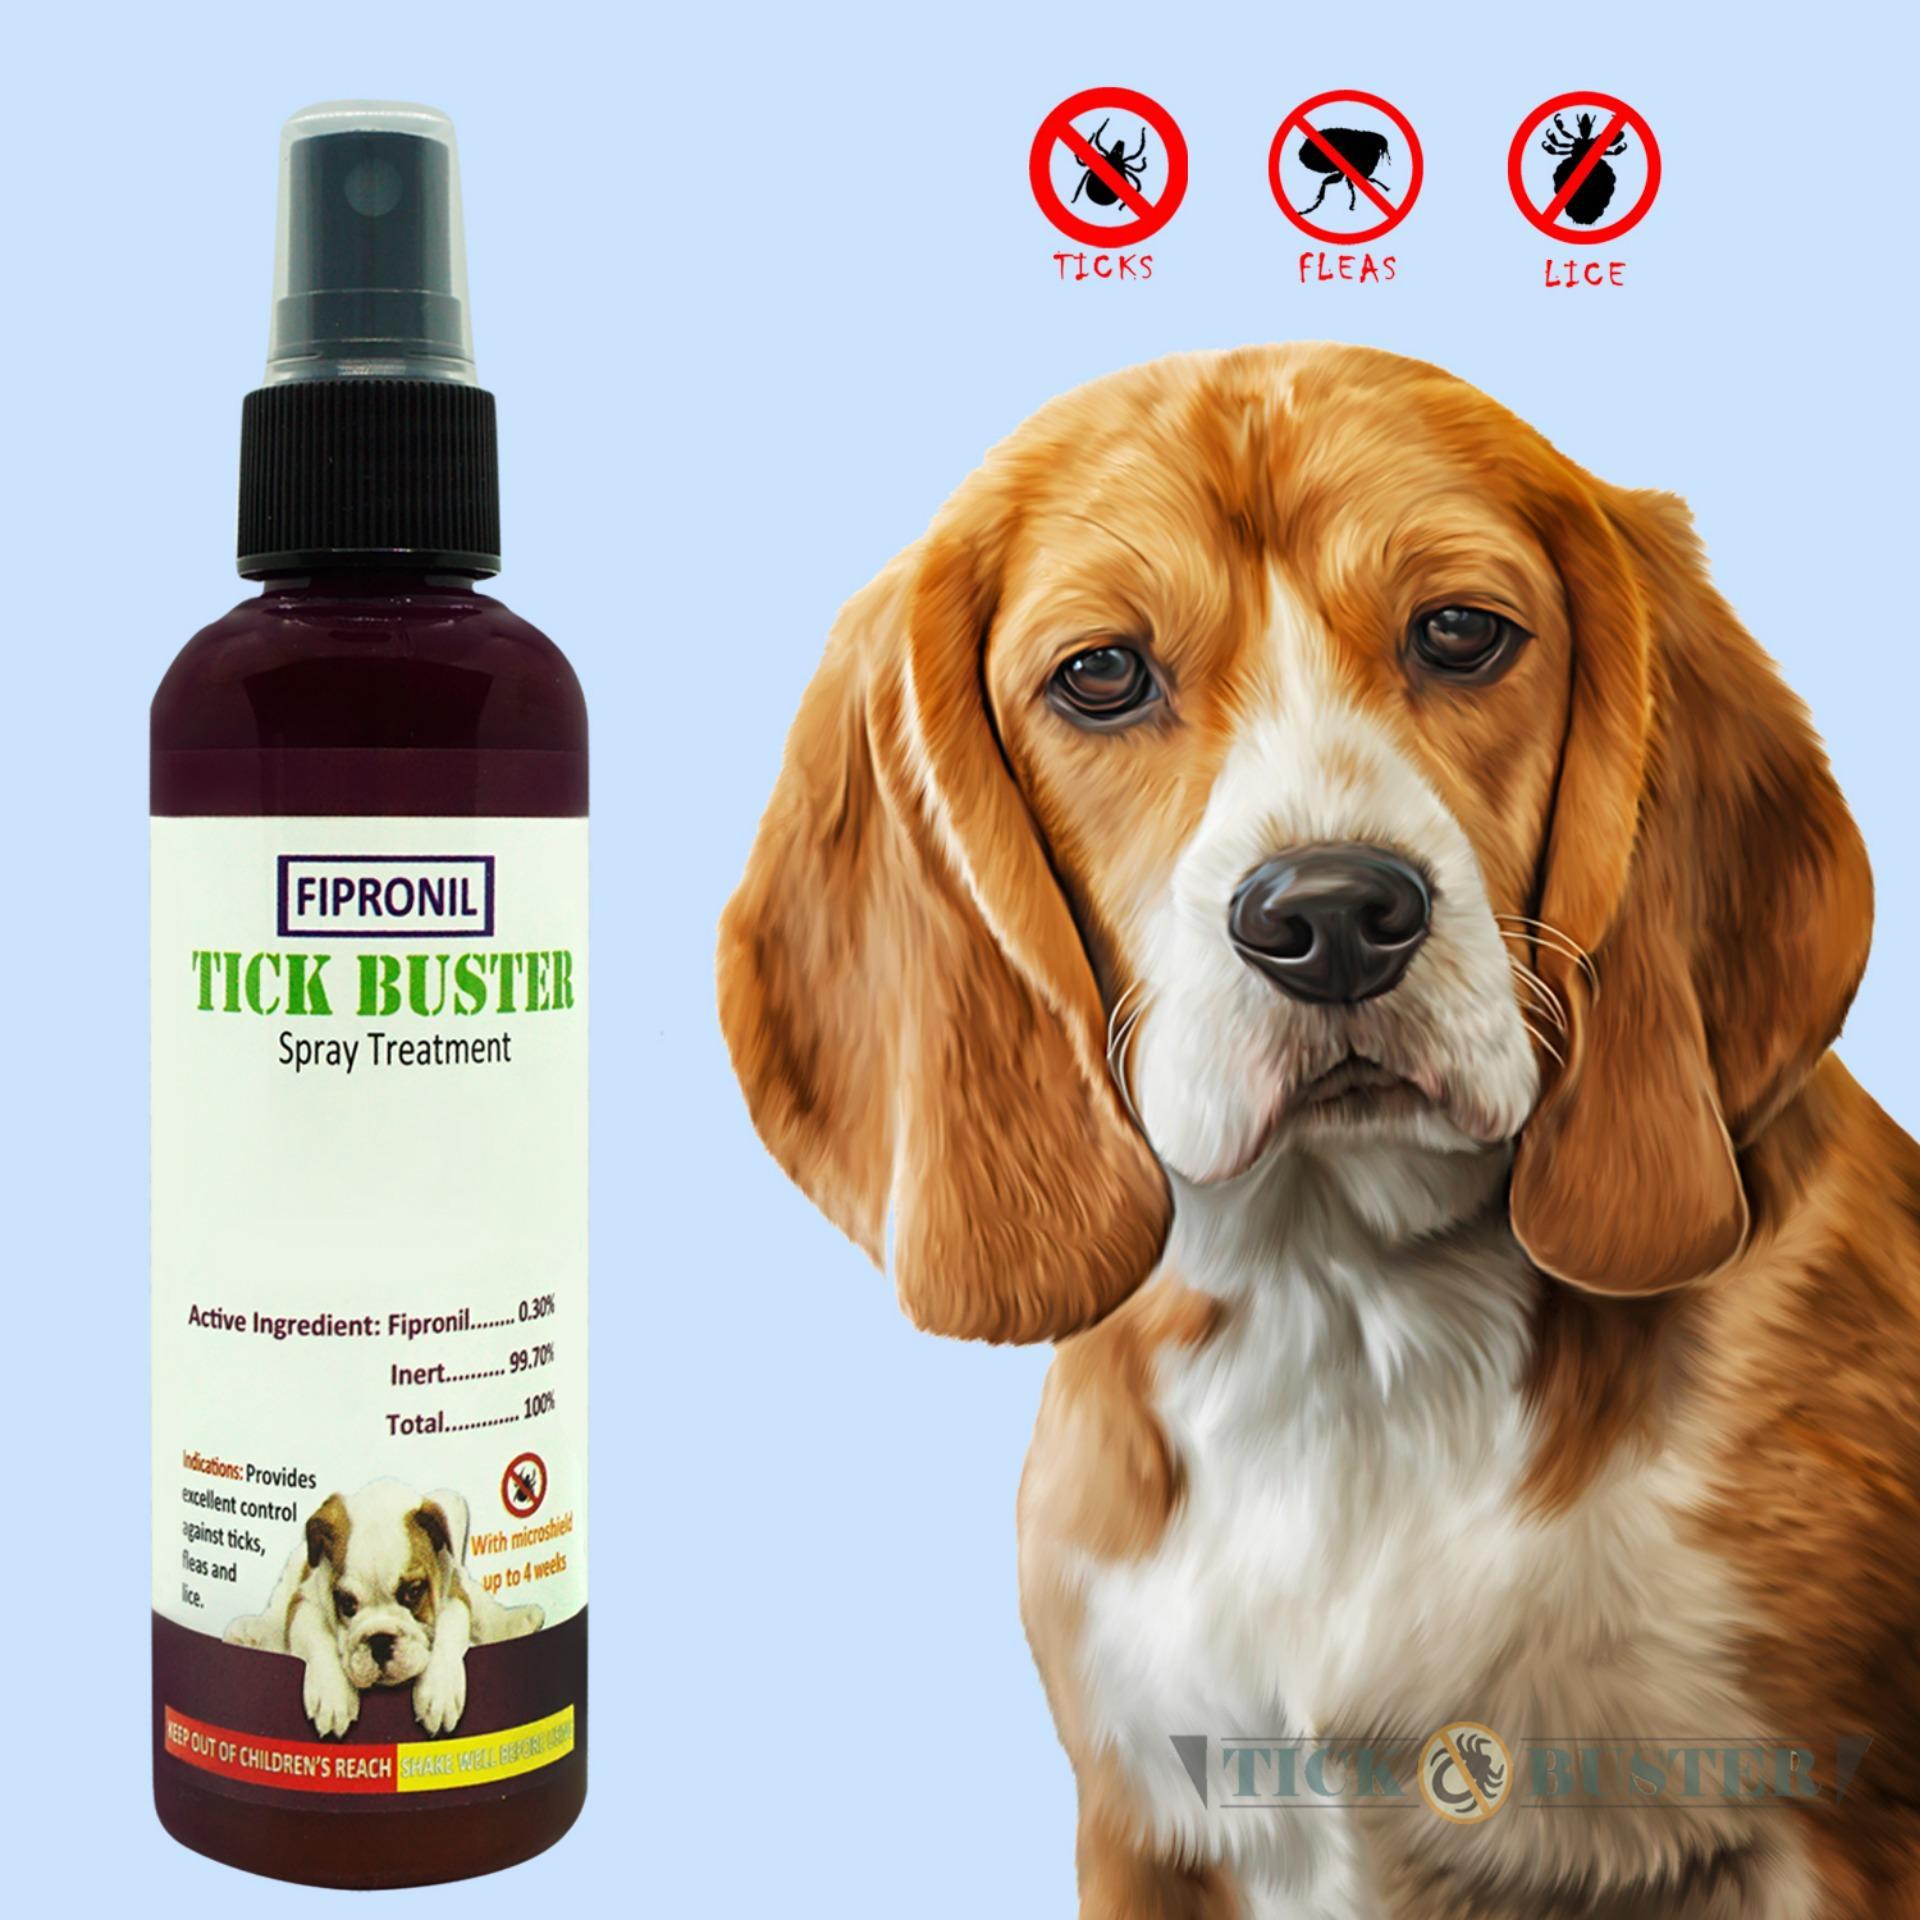 Tick Buster Anti-Ticks Fipronil Pet Spray Treatment 100ml By Tickbuster2.0.